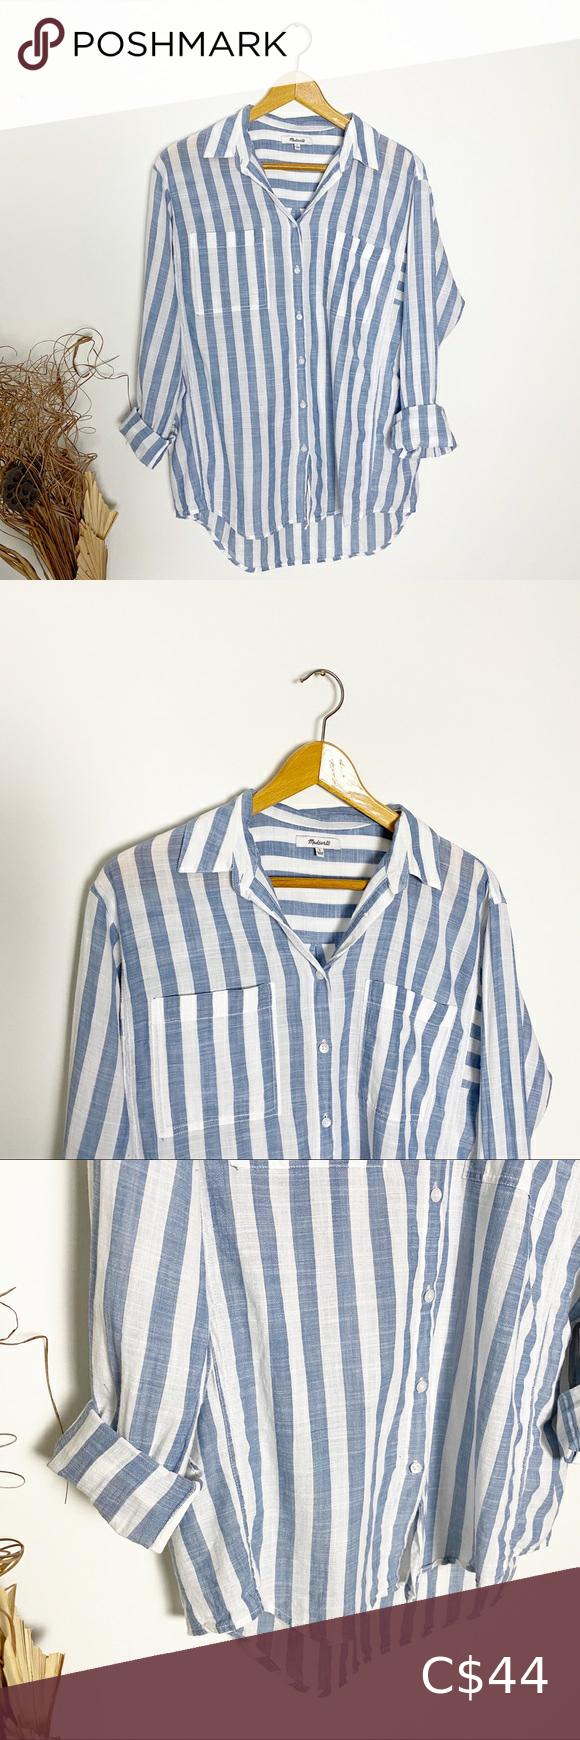 Madewell Blue White Striped Cotton Button Down Grey Long Sleeve Shirt Dark Denim Shirt Red Plaid Shirt